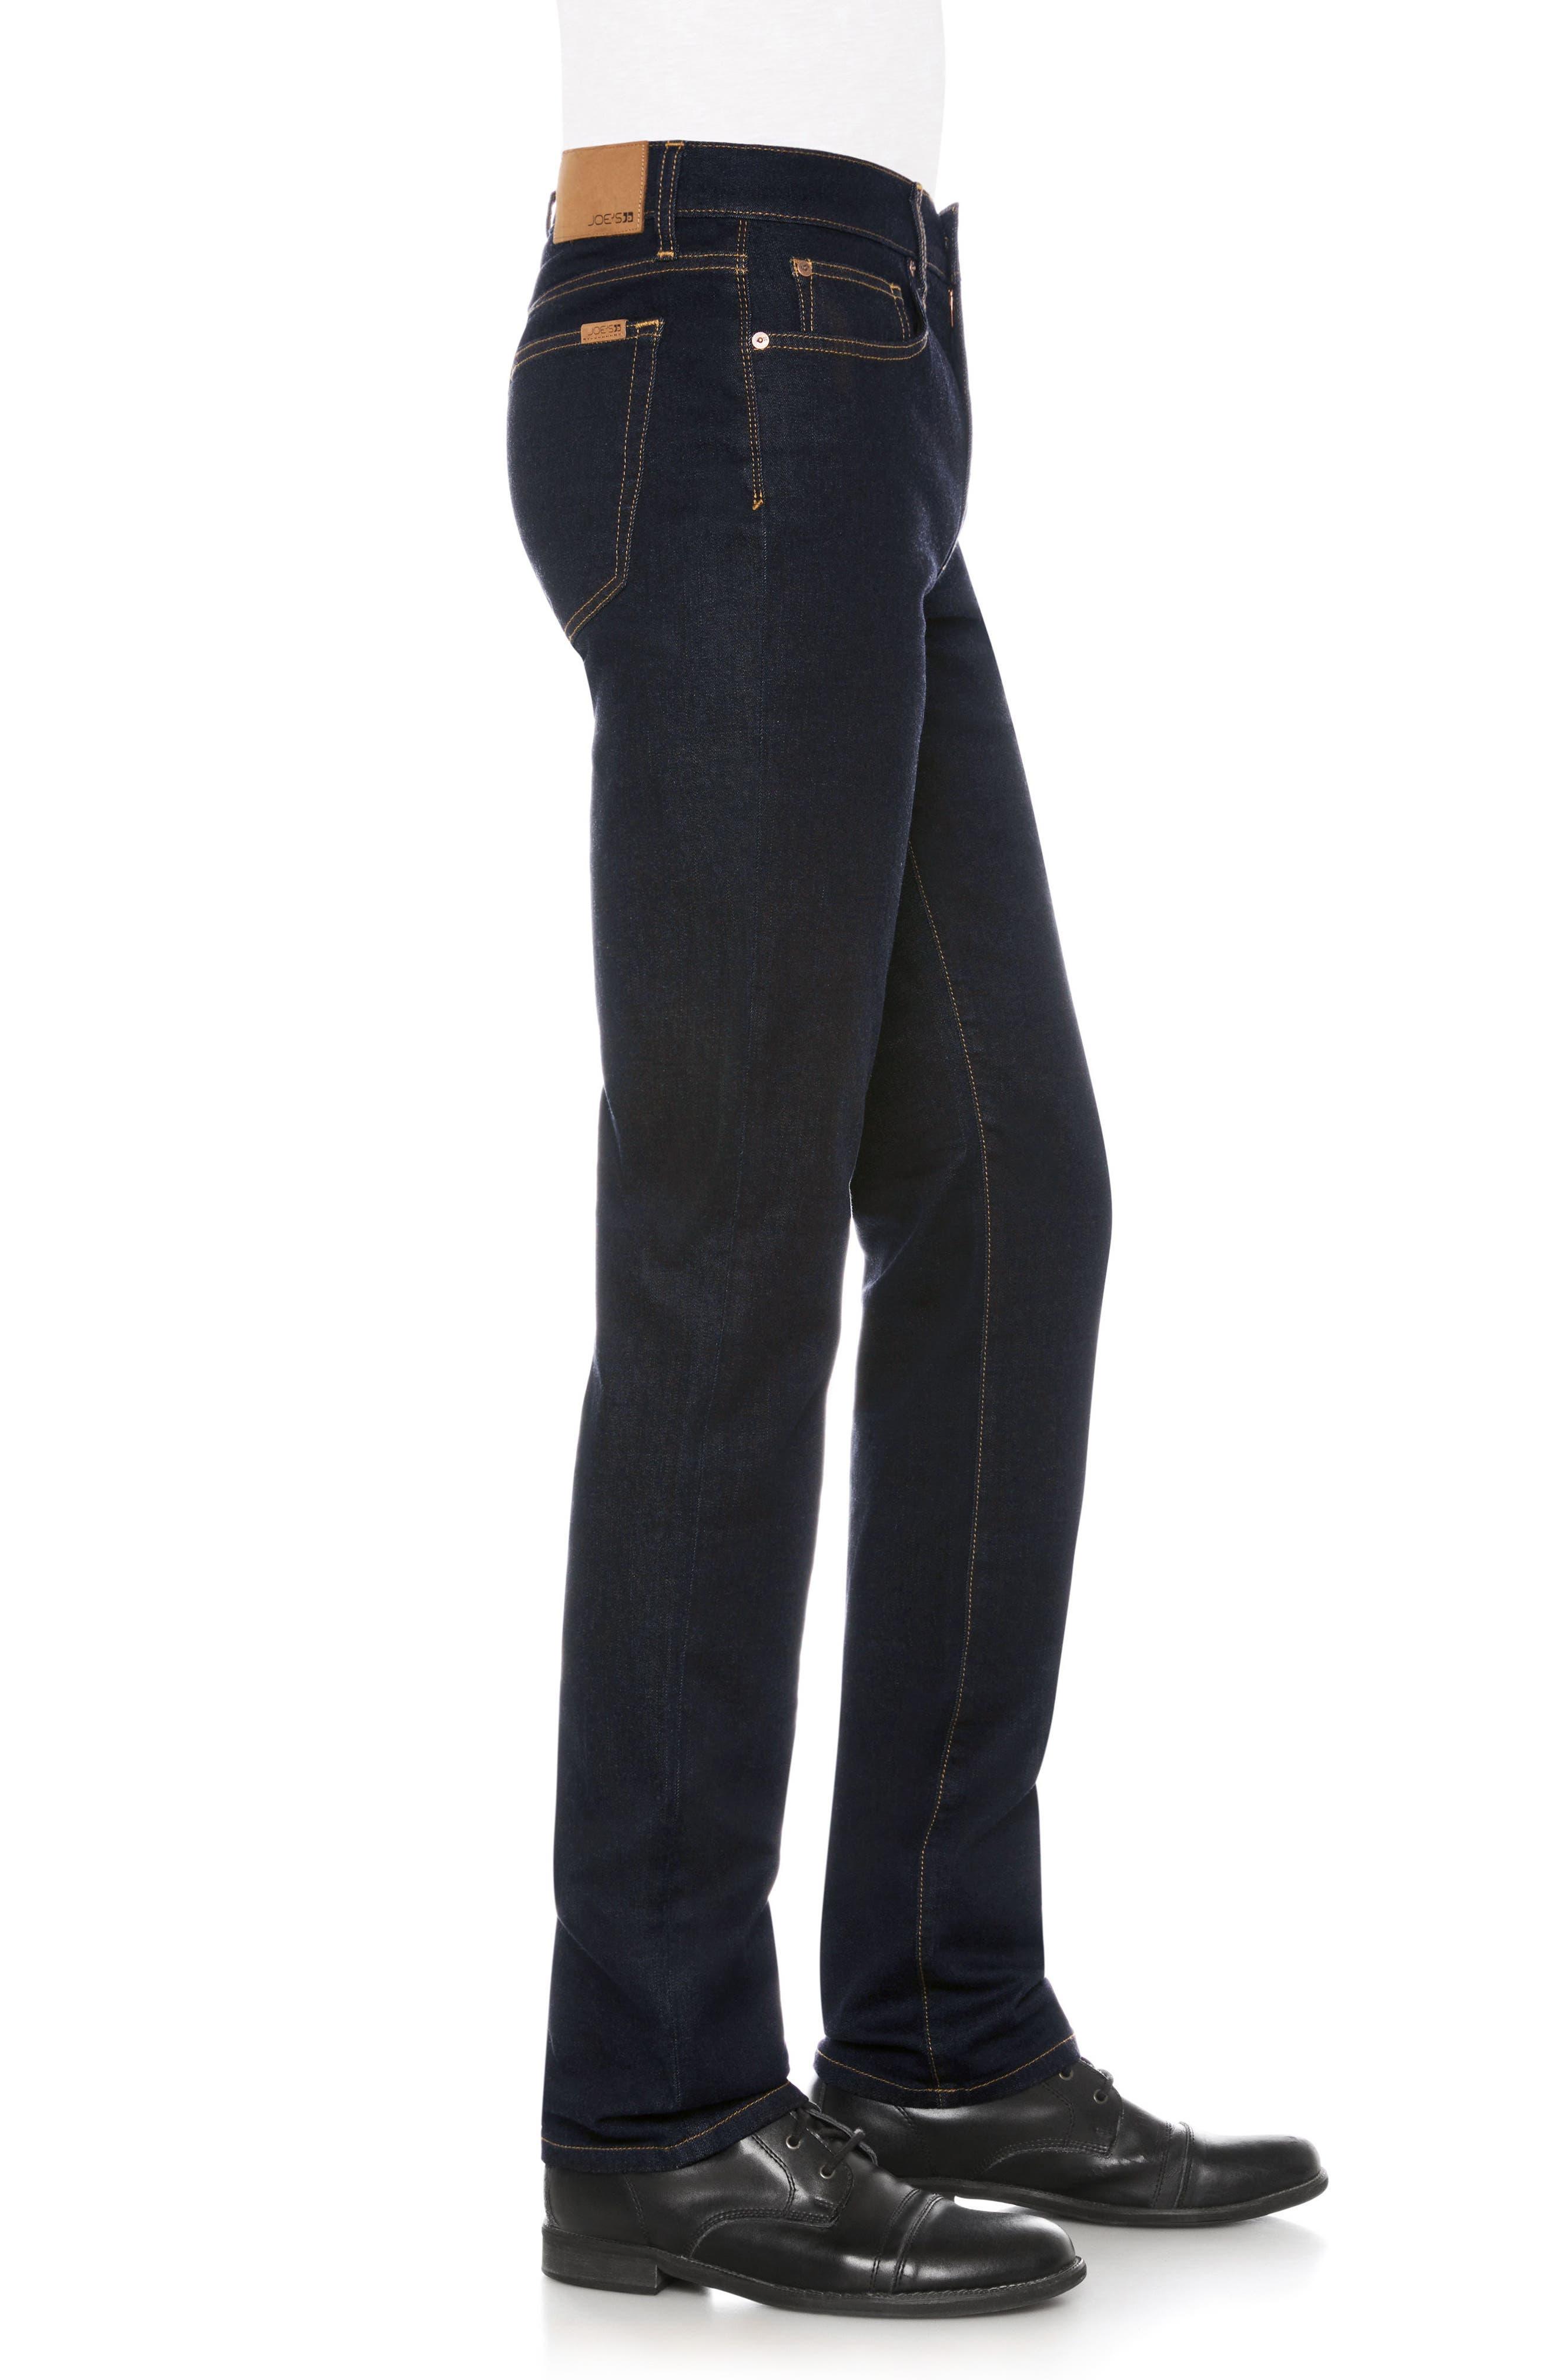 Brixton Slim Straight Fit Jeans,                             Alternate thumbnail 3, color,                             Jazz